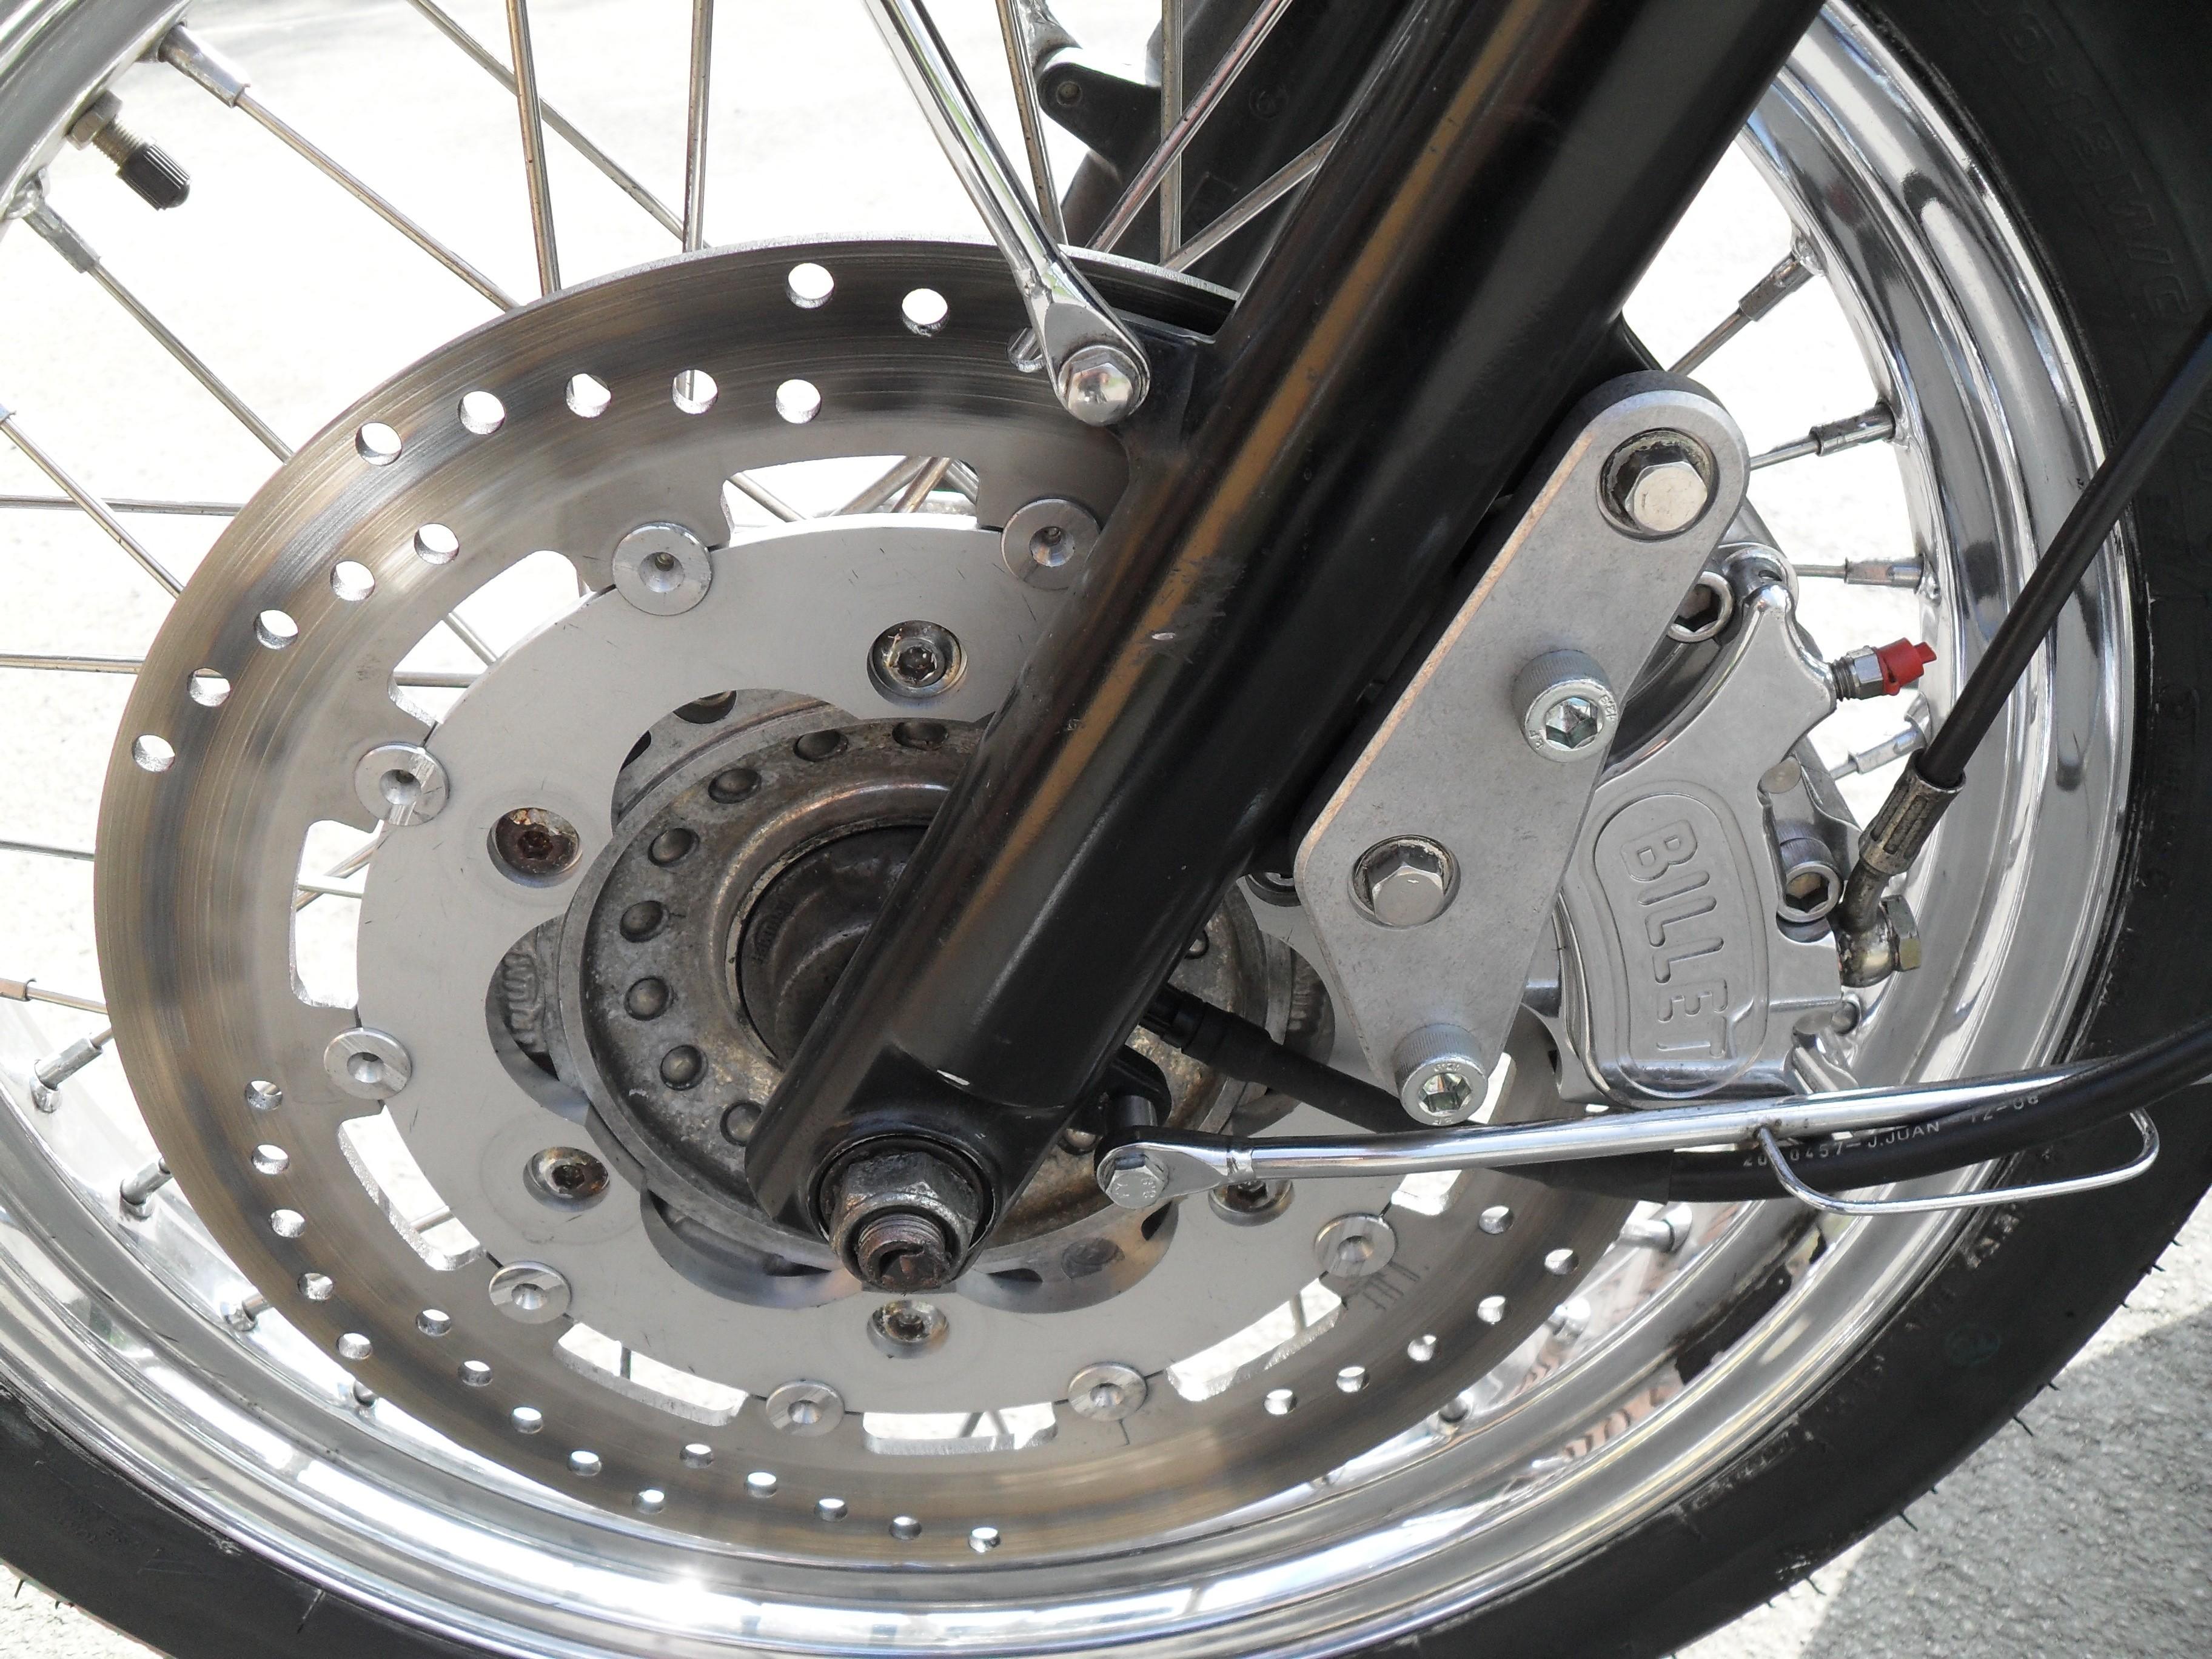 Bonneville / T100 325mm / 4 piston front brake upgrade kit FITS 2000-2015 NOT CAST WHEEL SE VERSION